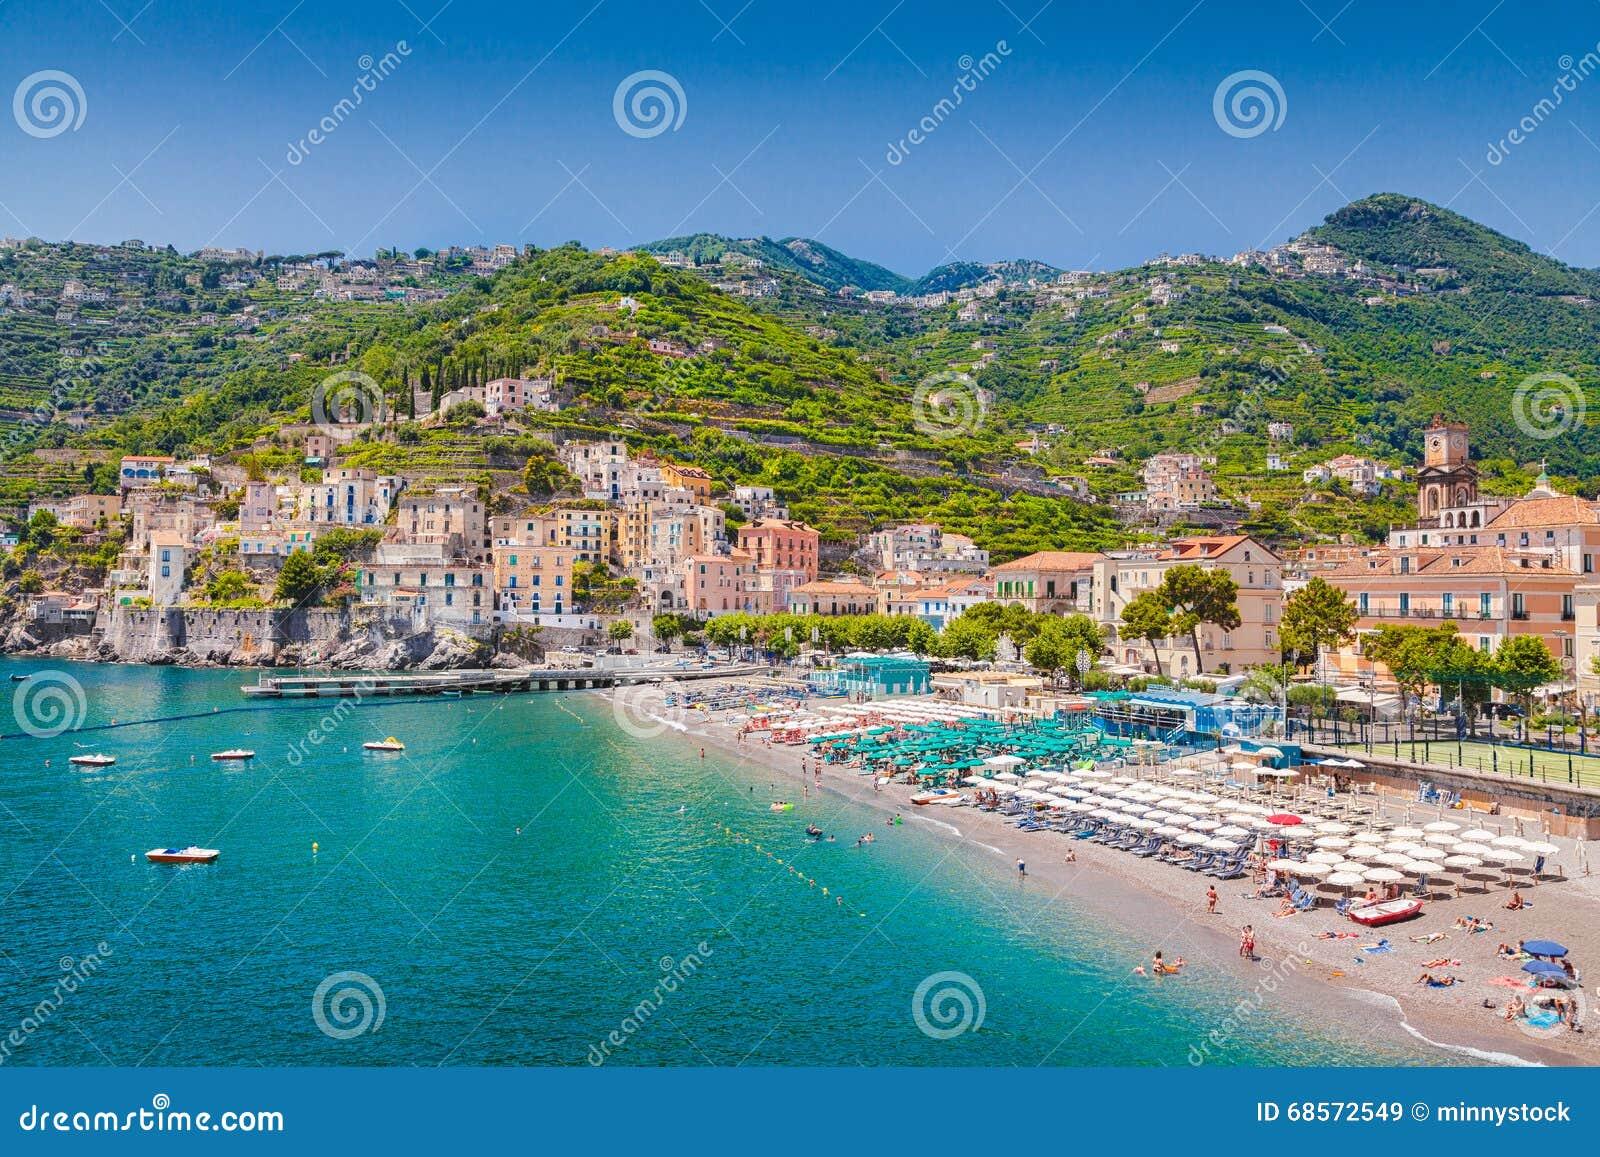 Postcard view of Minori, Amalfi Coast, Campania, Italy